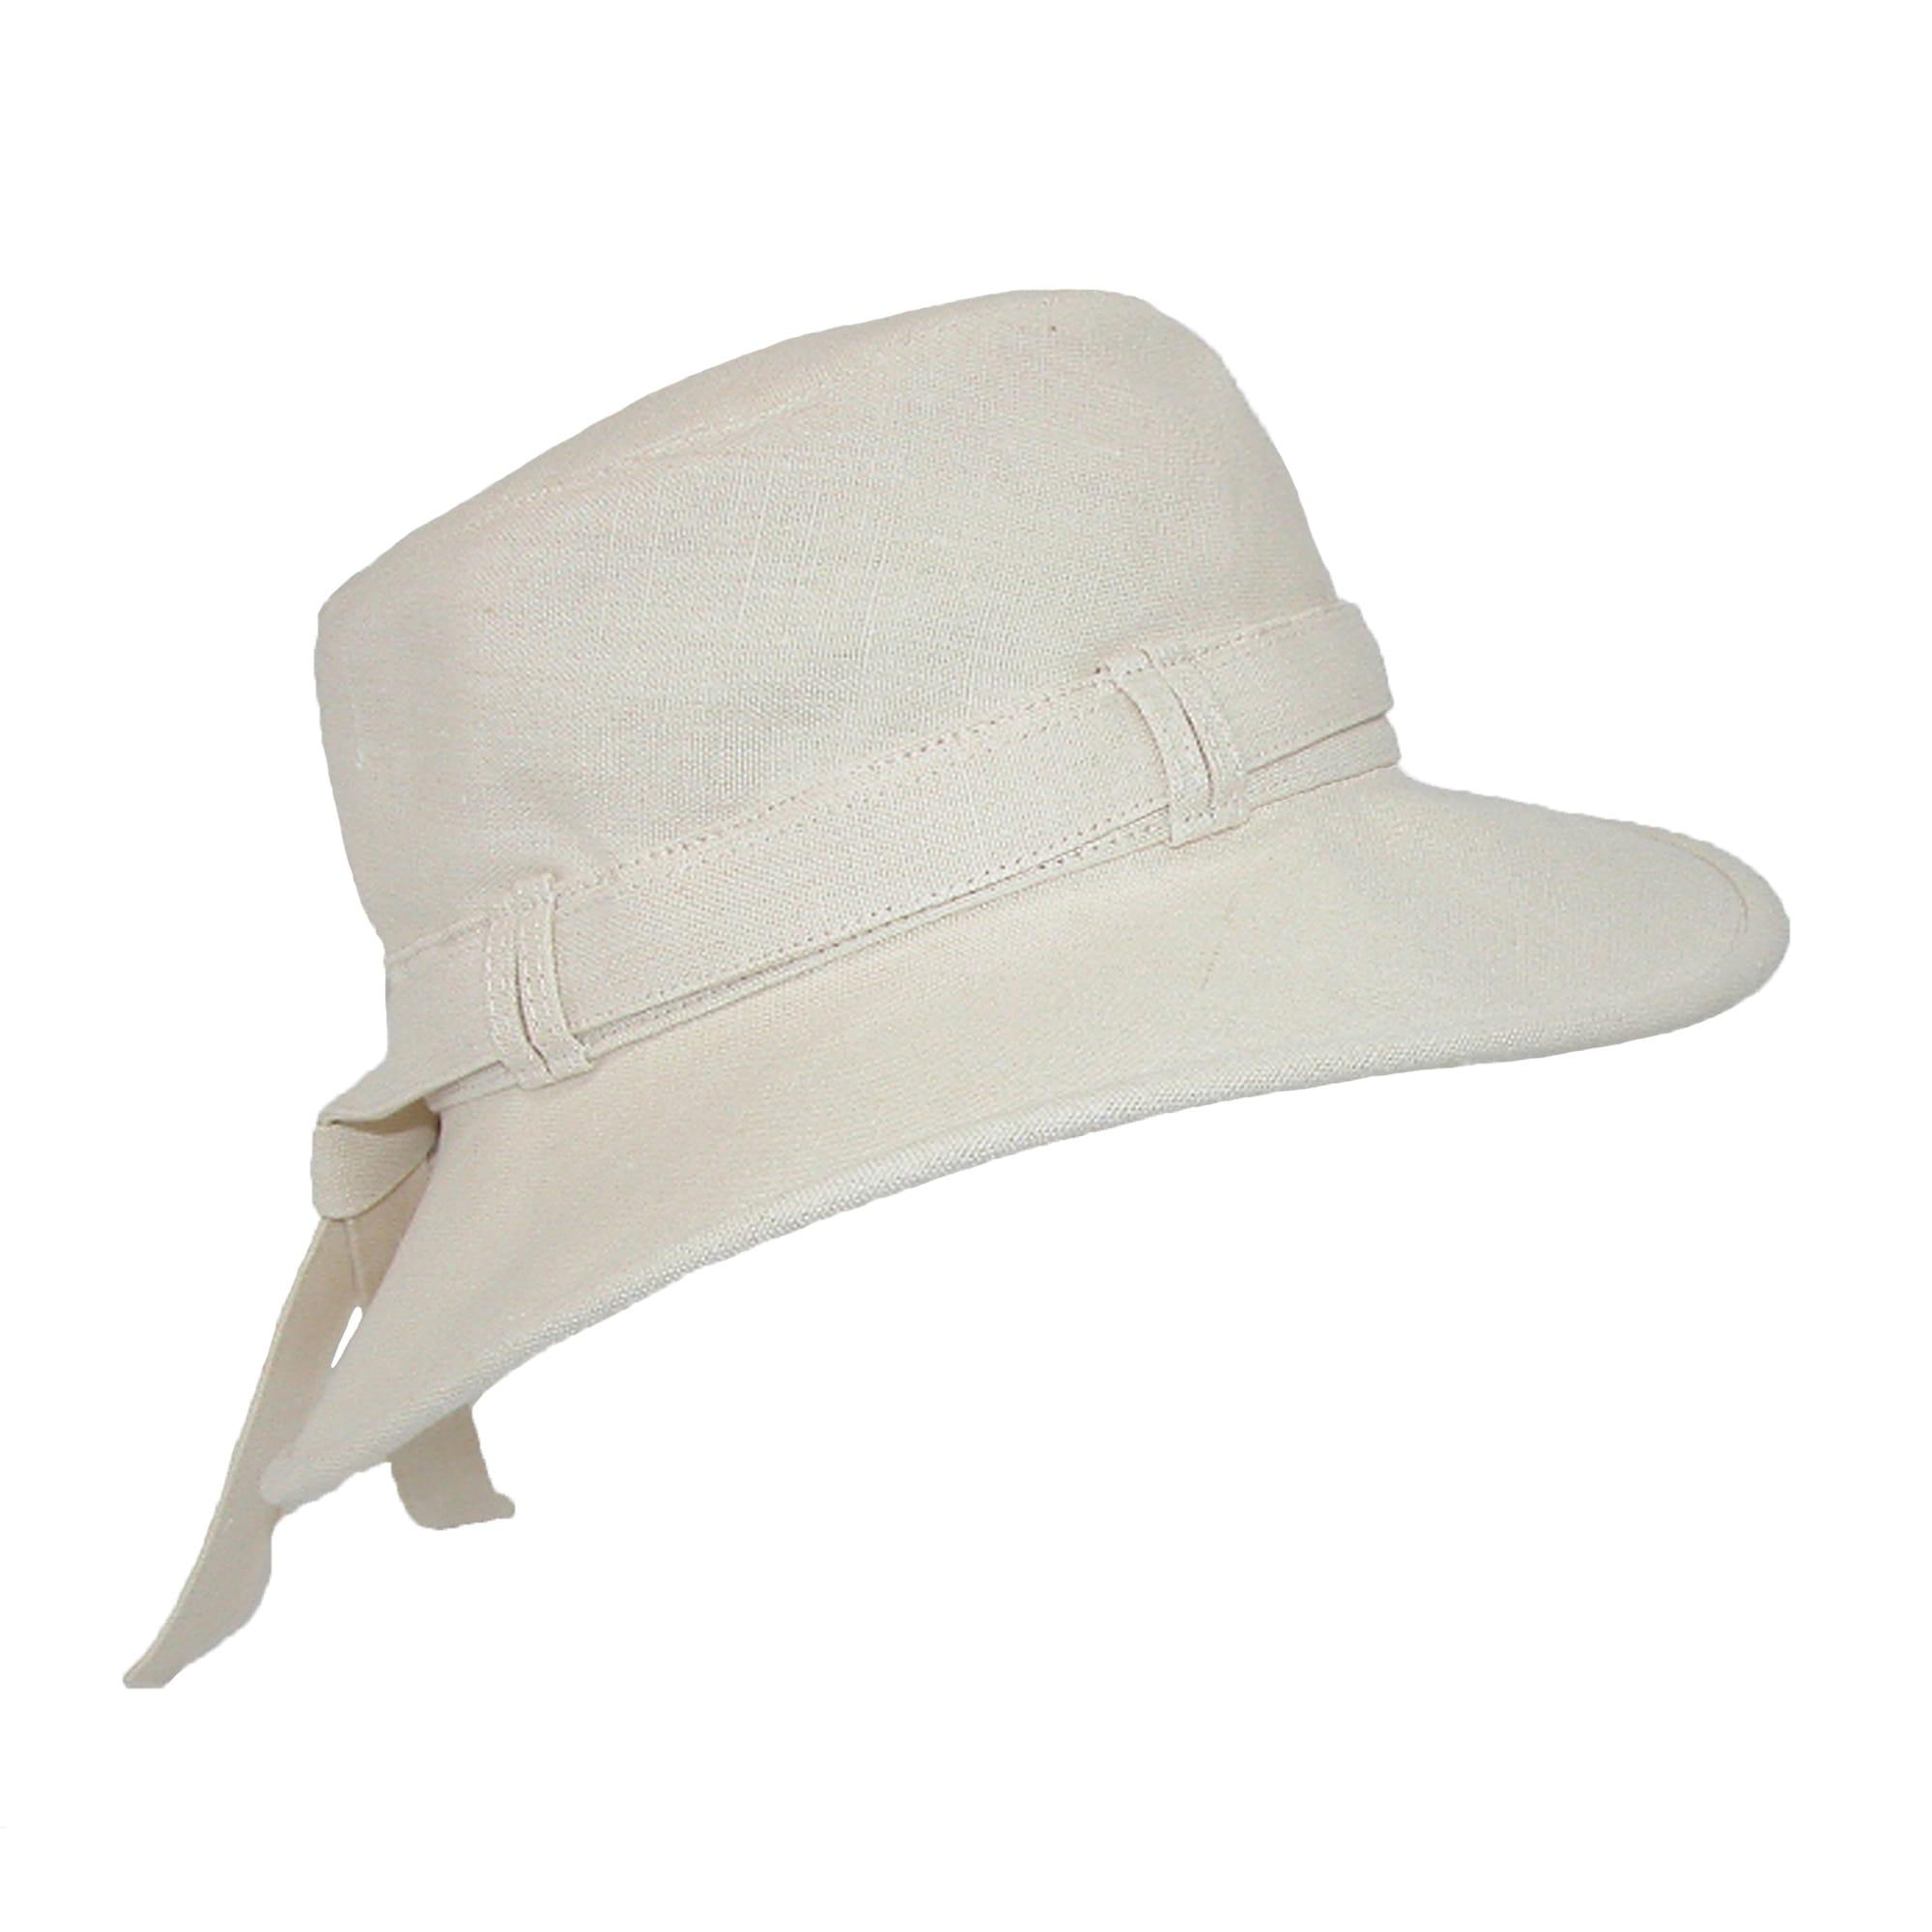 Shop Tilley Women s TH9 Hemp Sun Hat - Natural - Free Shipping Today -  Overstock - 14278731 9f4d635f45c